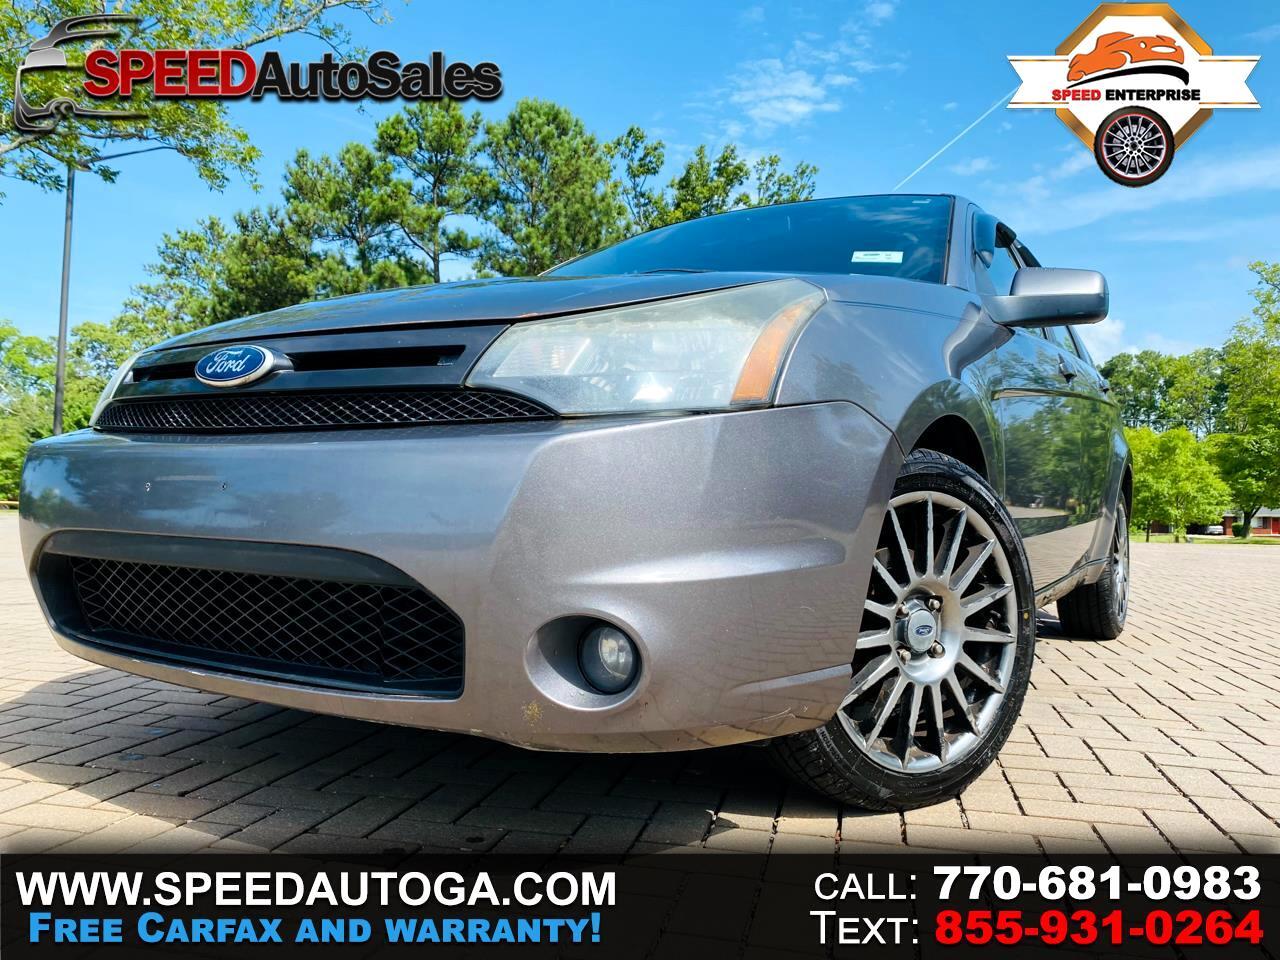 Ford Focus SES Sedan 2011